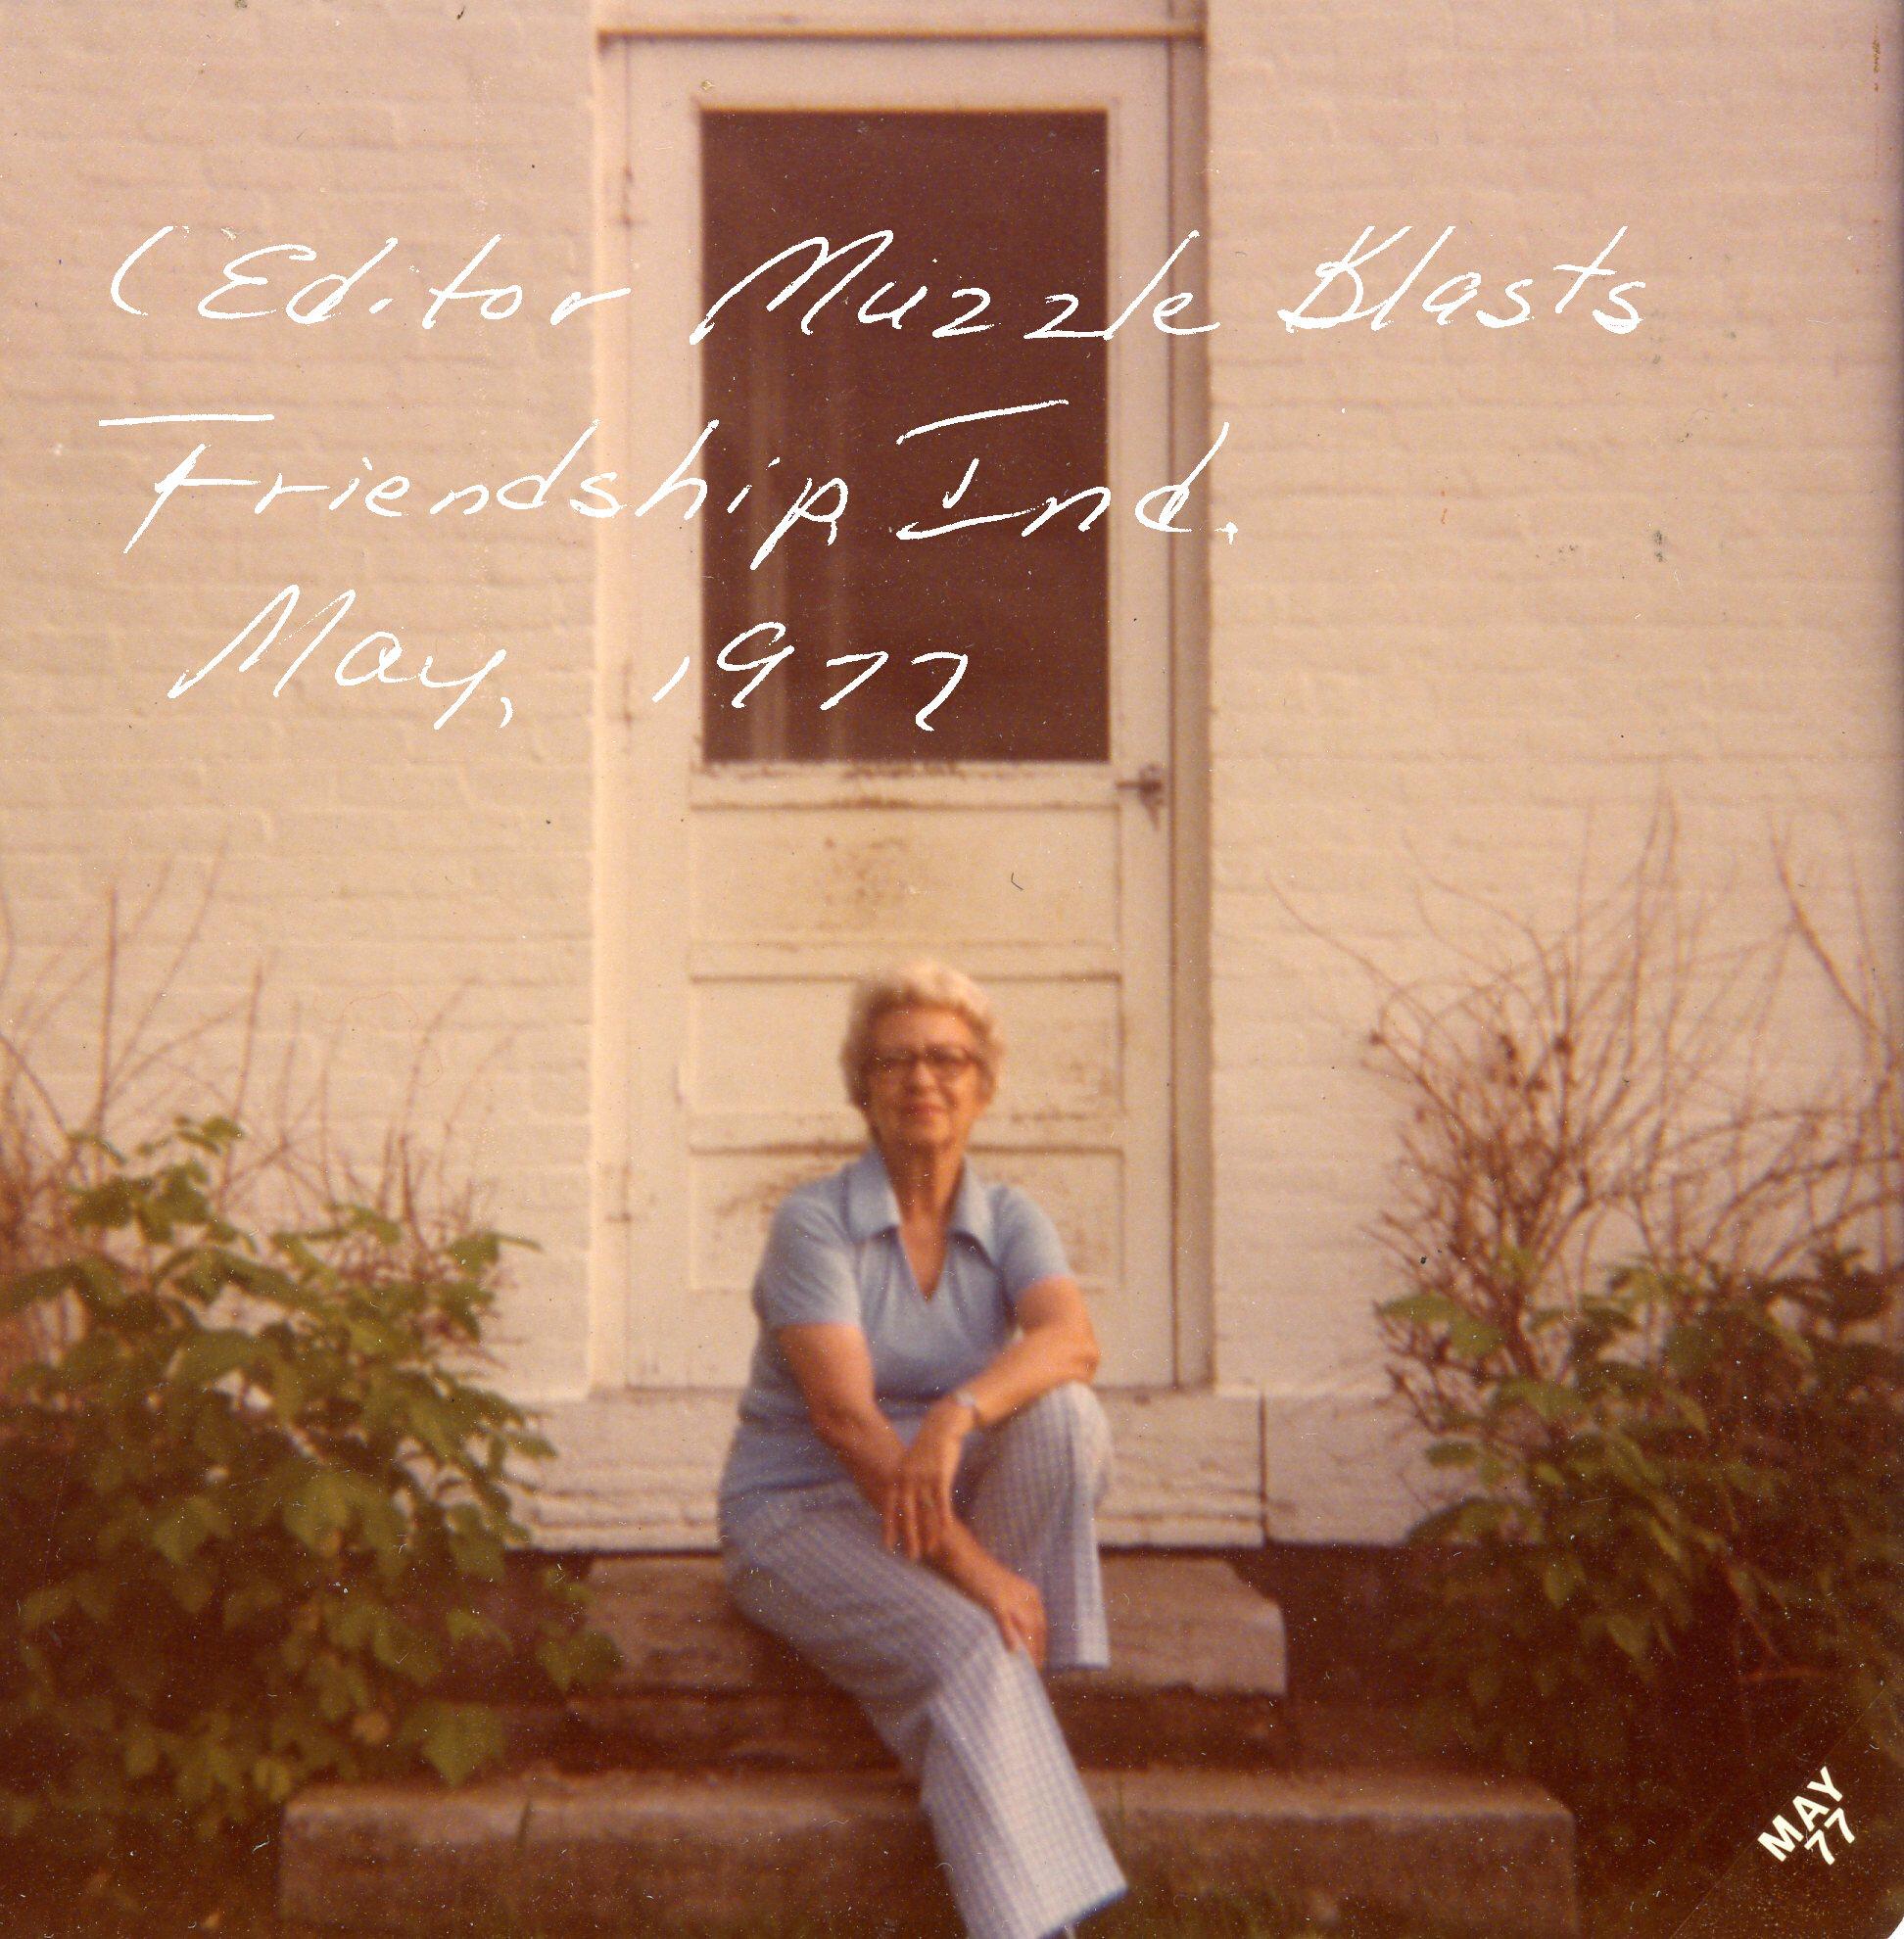 Maxine_Moss_1977.jpg